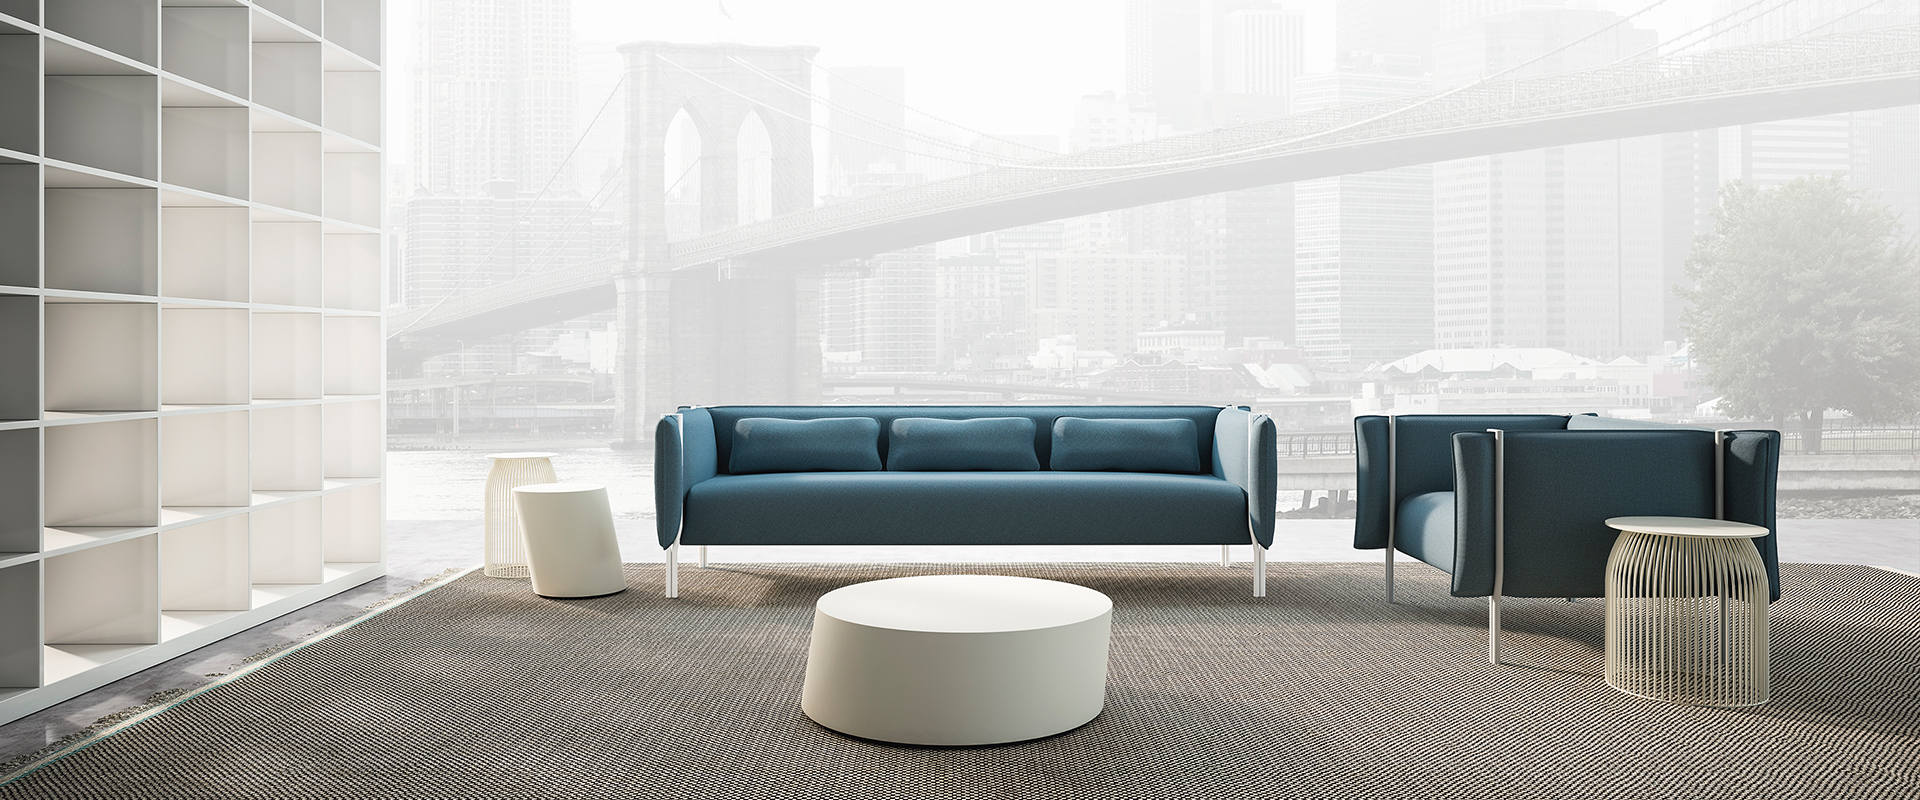 Casa fondo europeo de interior minimalista hogar muebles for Casa minimalista interior cocina